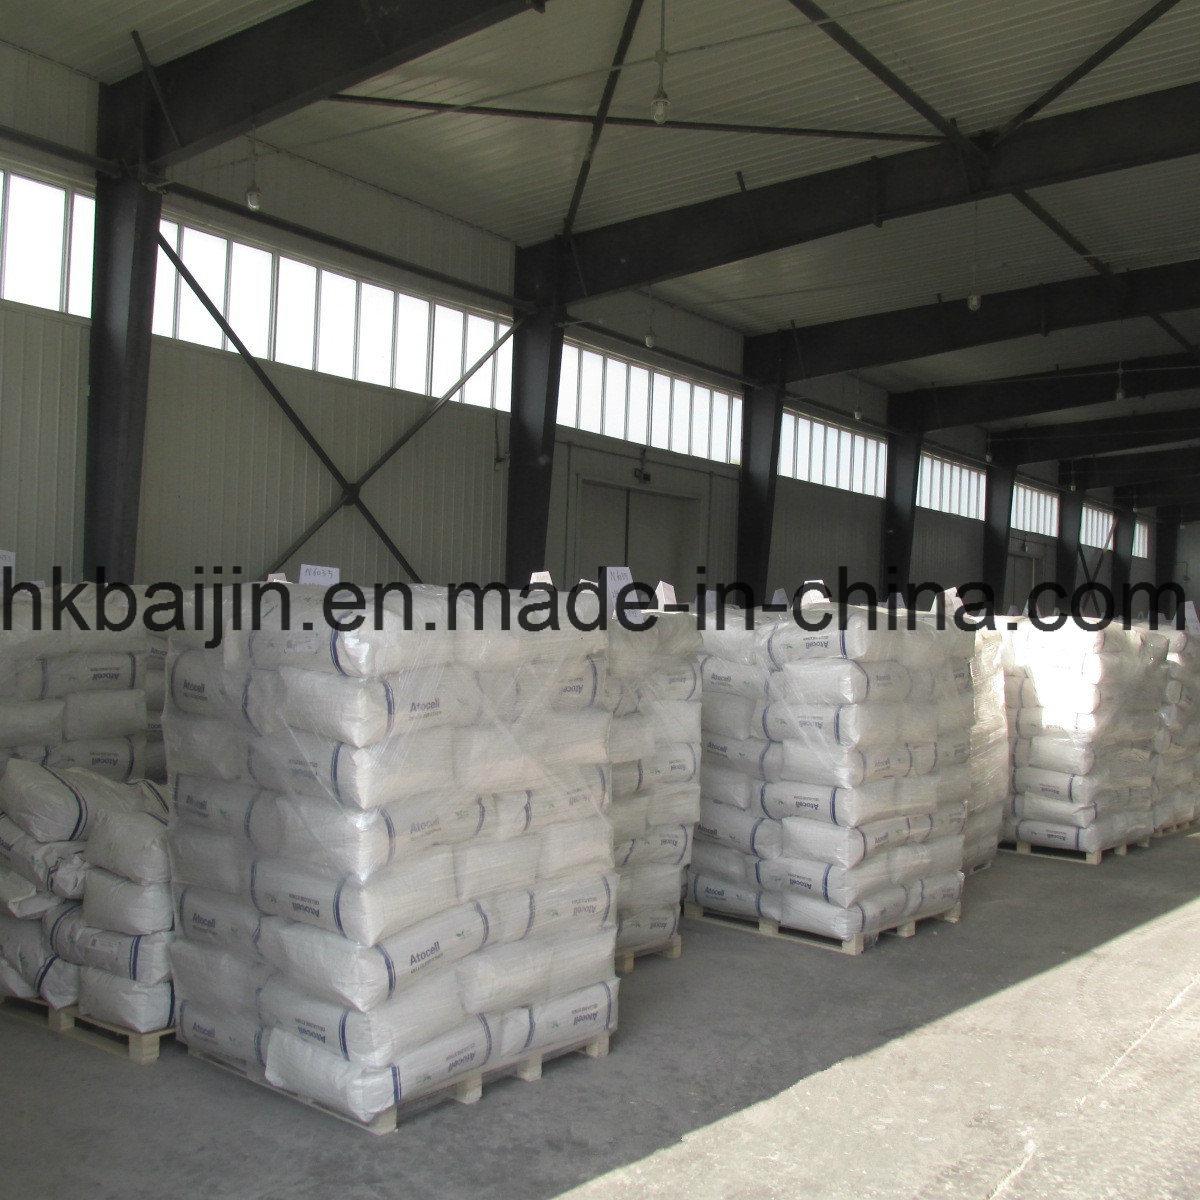 Hydroxy Propyl Methyl Cellulose HPMC price